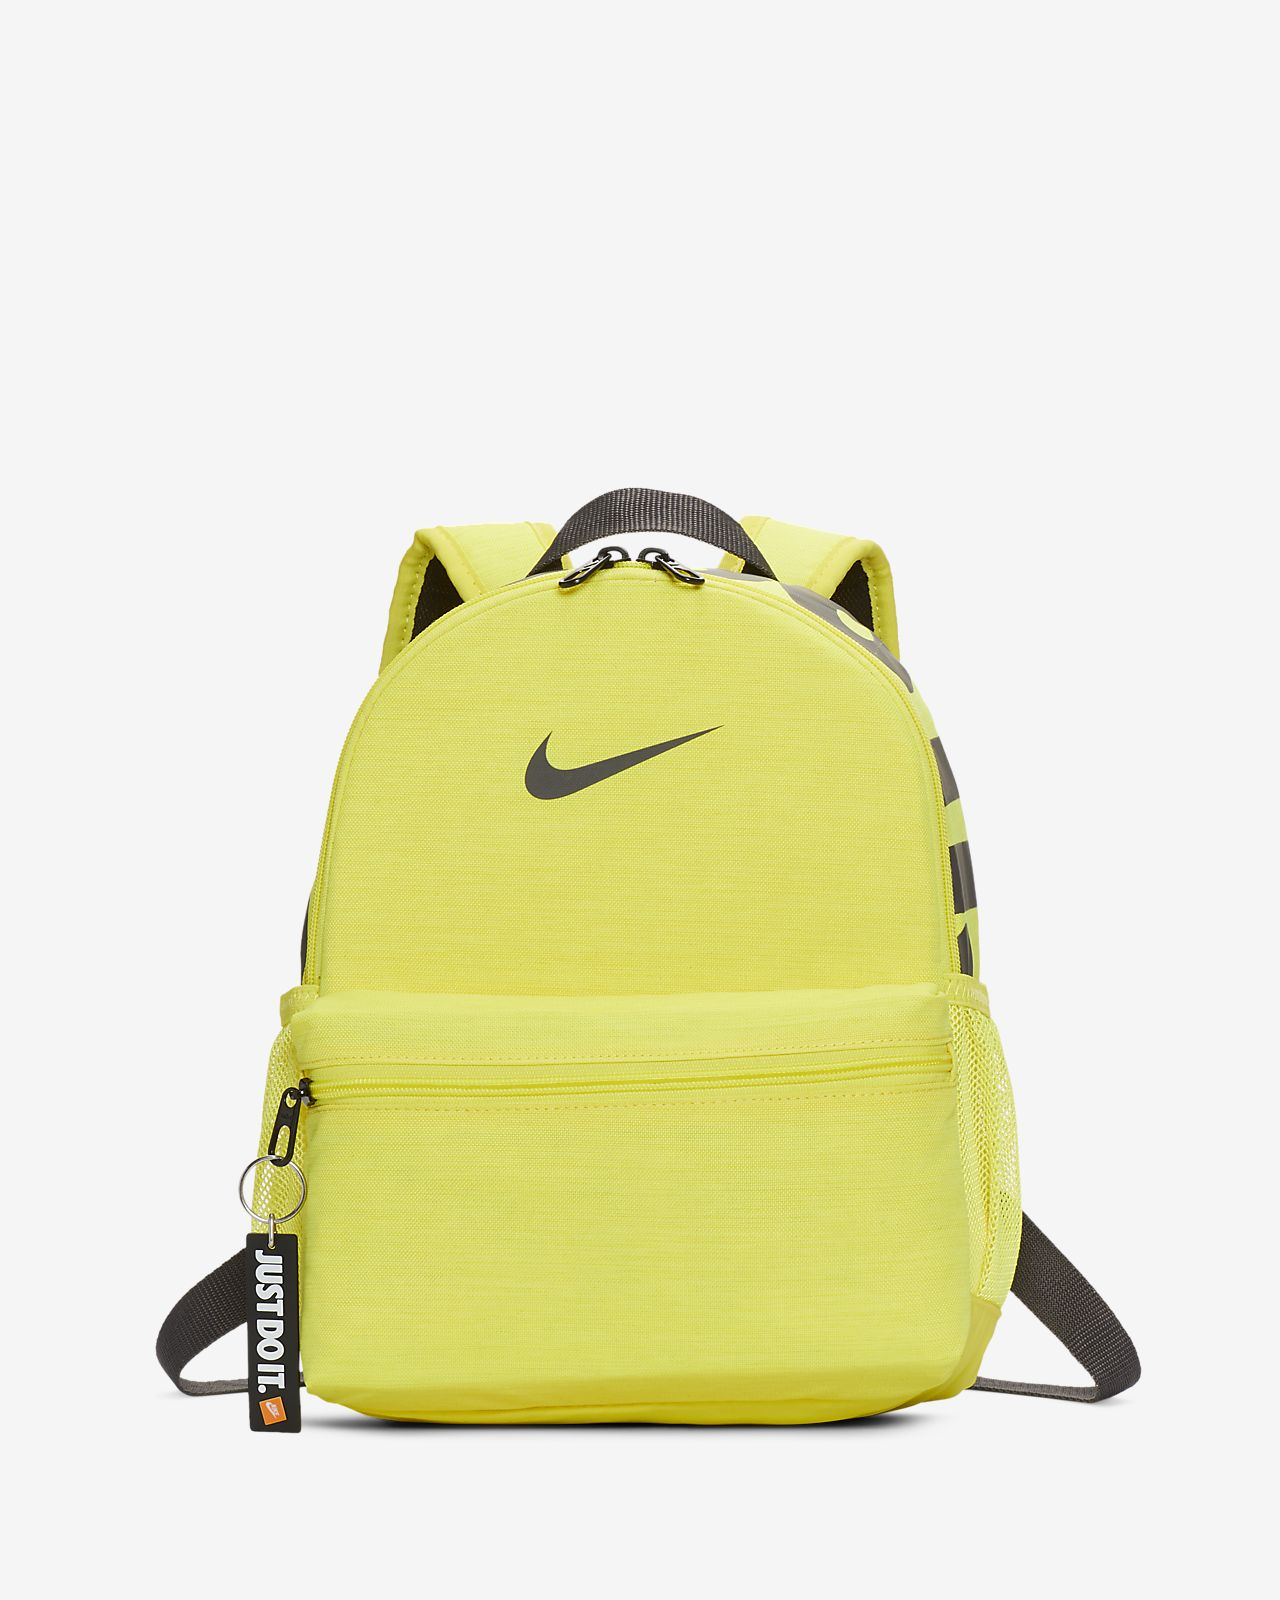 Nike Brasilia Just Do It 儿童双肩包